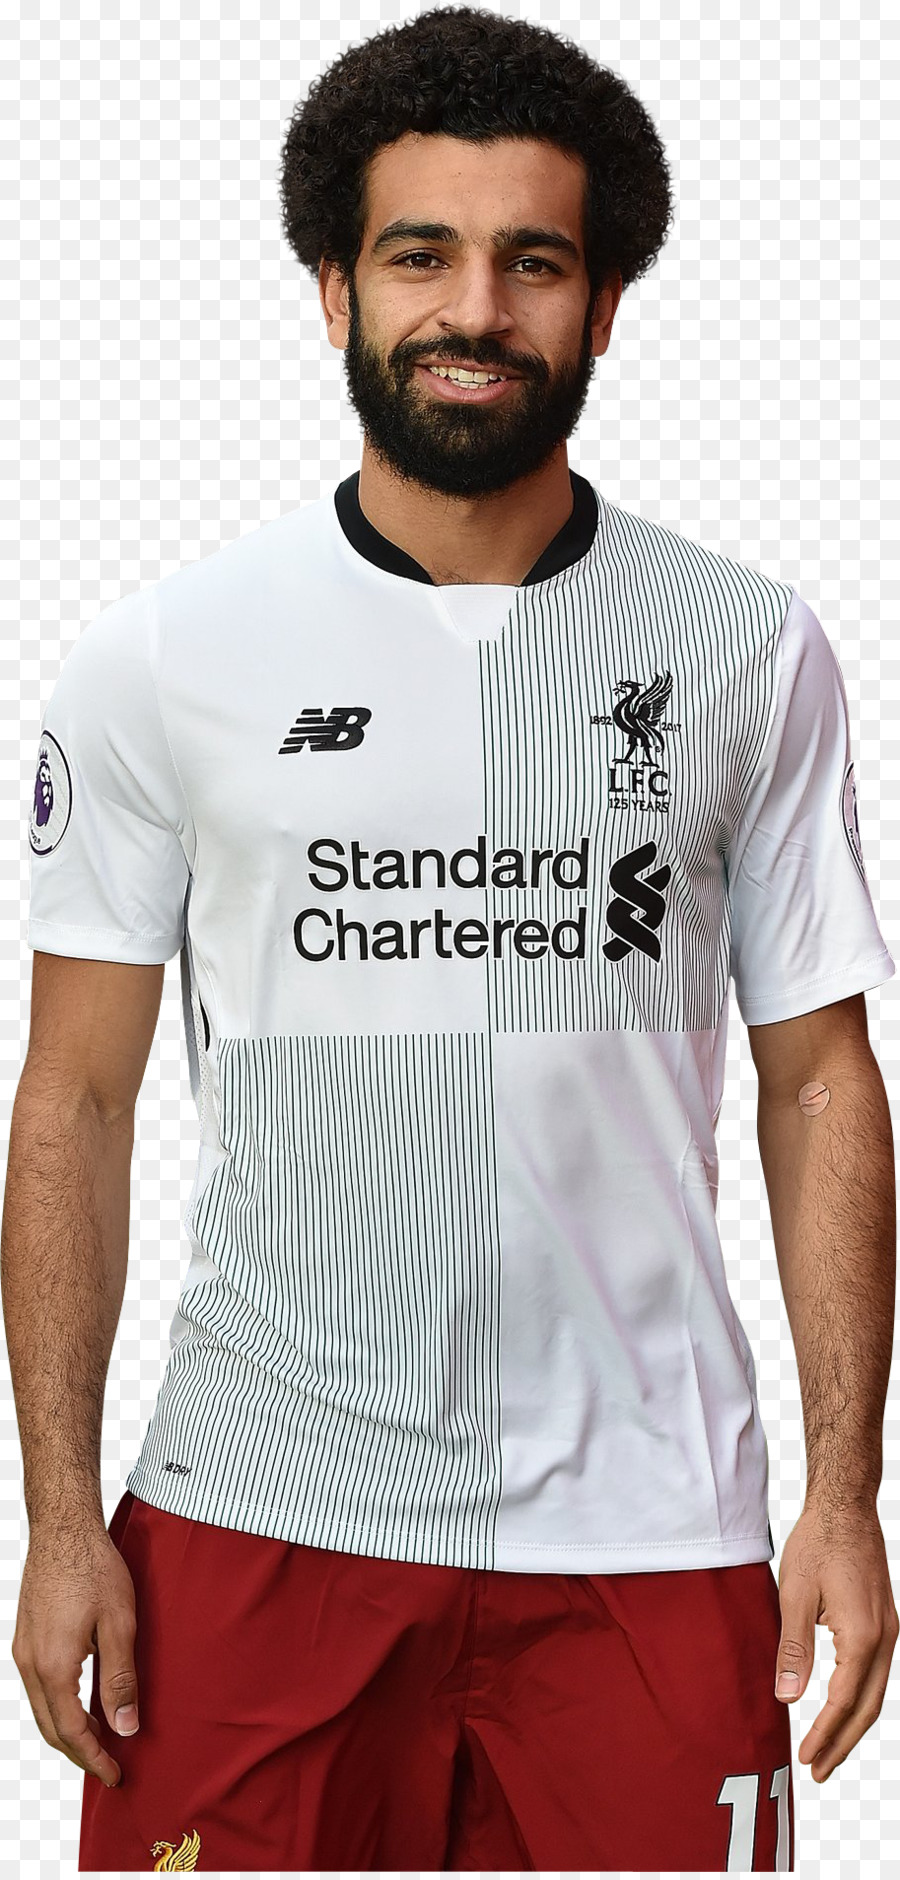 Mohamed Salah 2017–18 Liverpool F.C. season - Salah liverpool png ... 3970a8a24